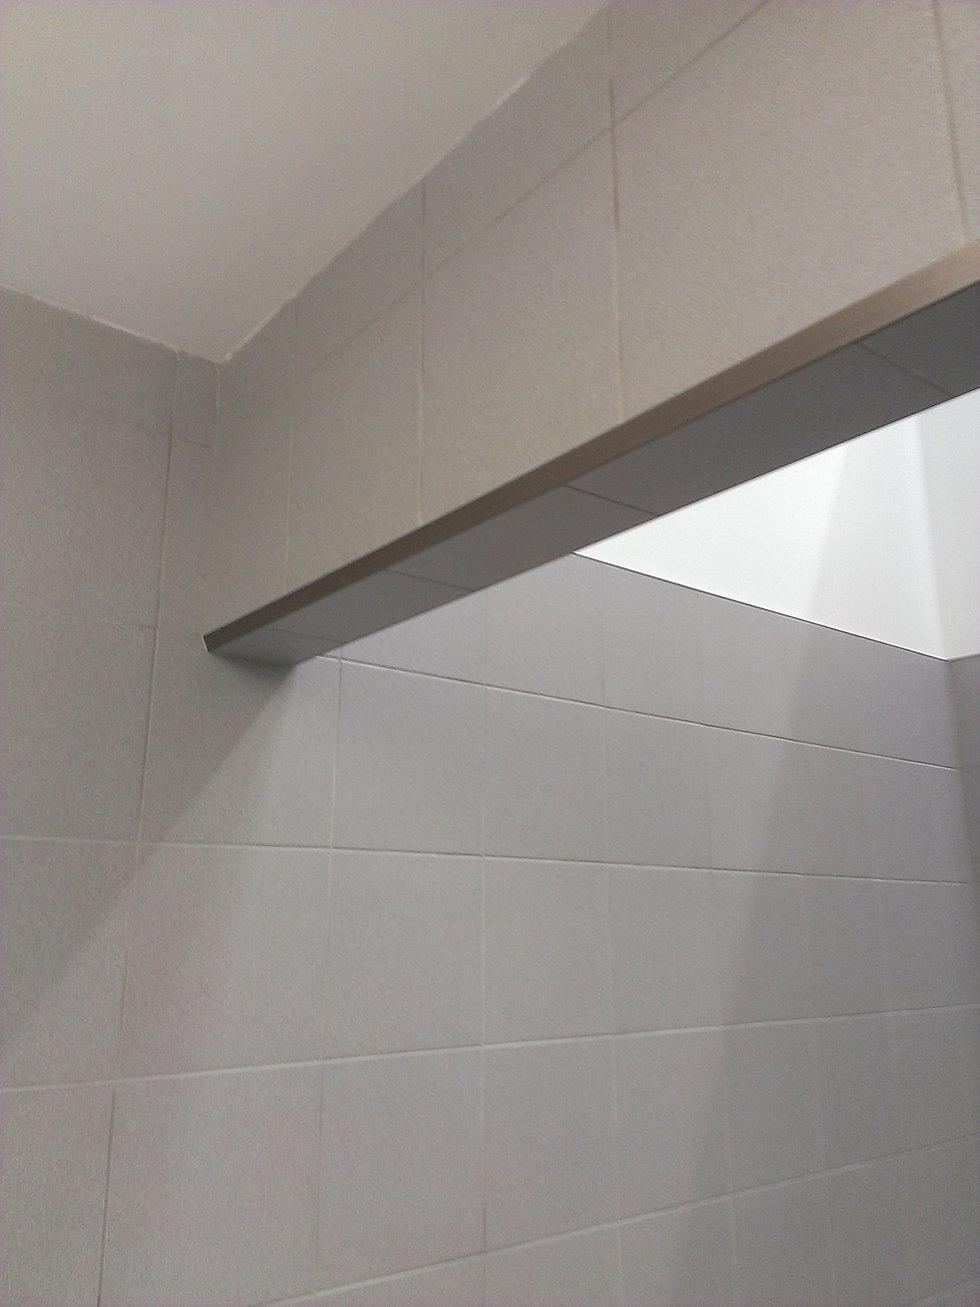 Schapercompany schaper construction costco bathroom remodel dailygadgetfo Image collections